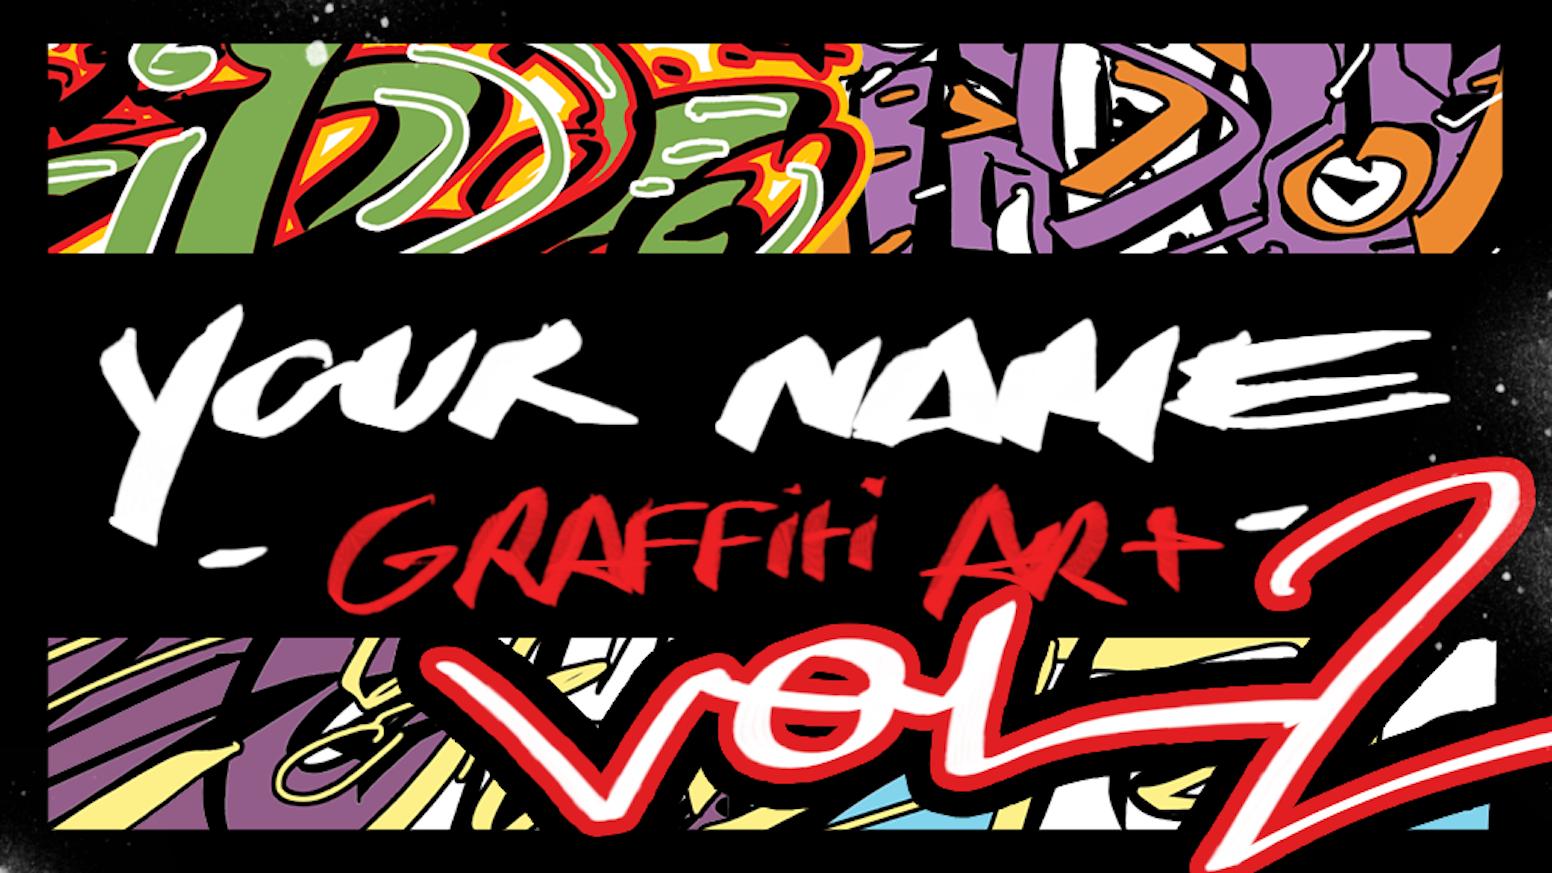 Your name graffiti art vol 2